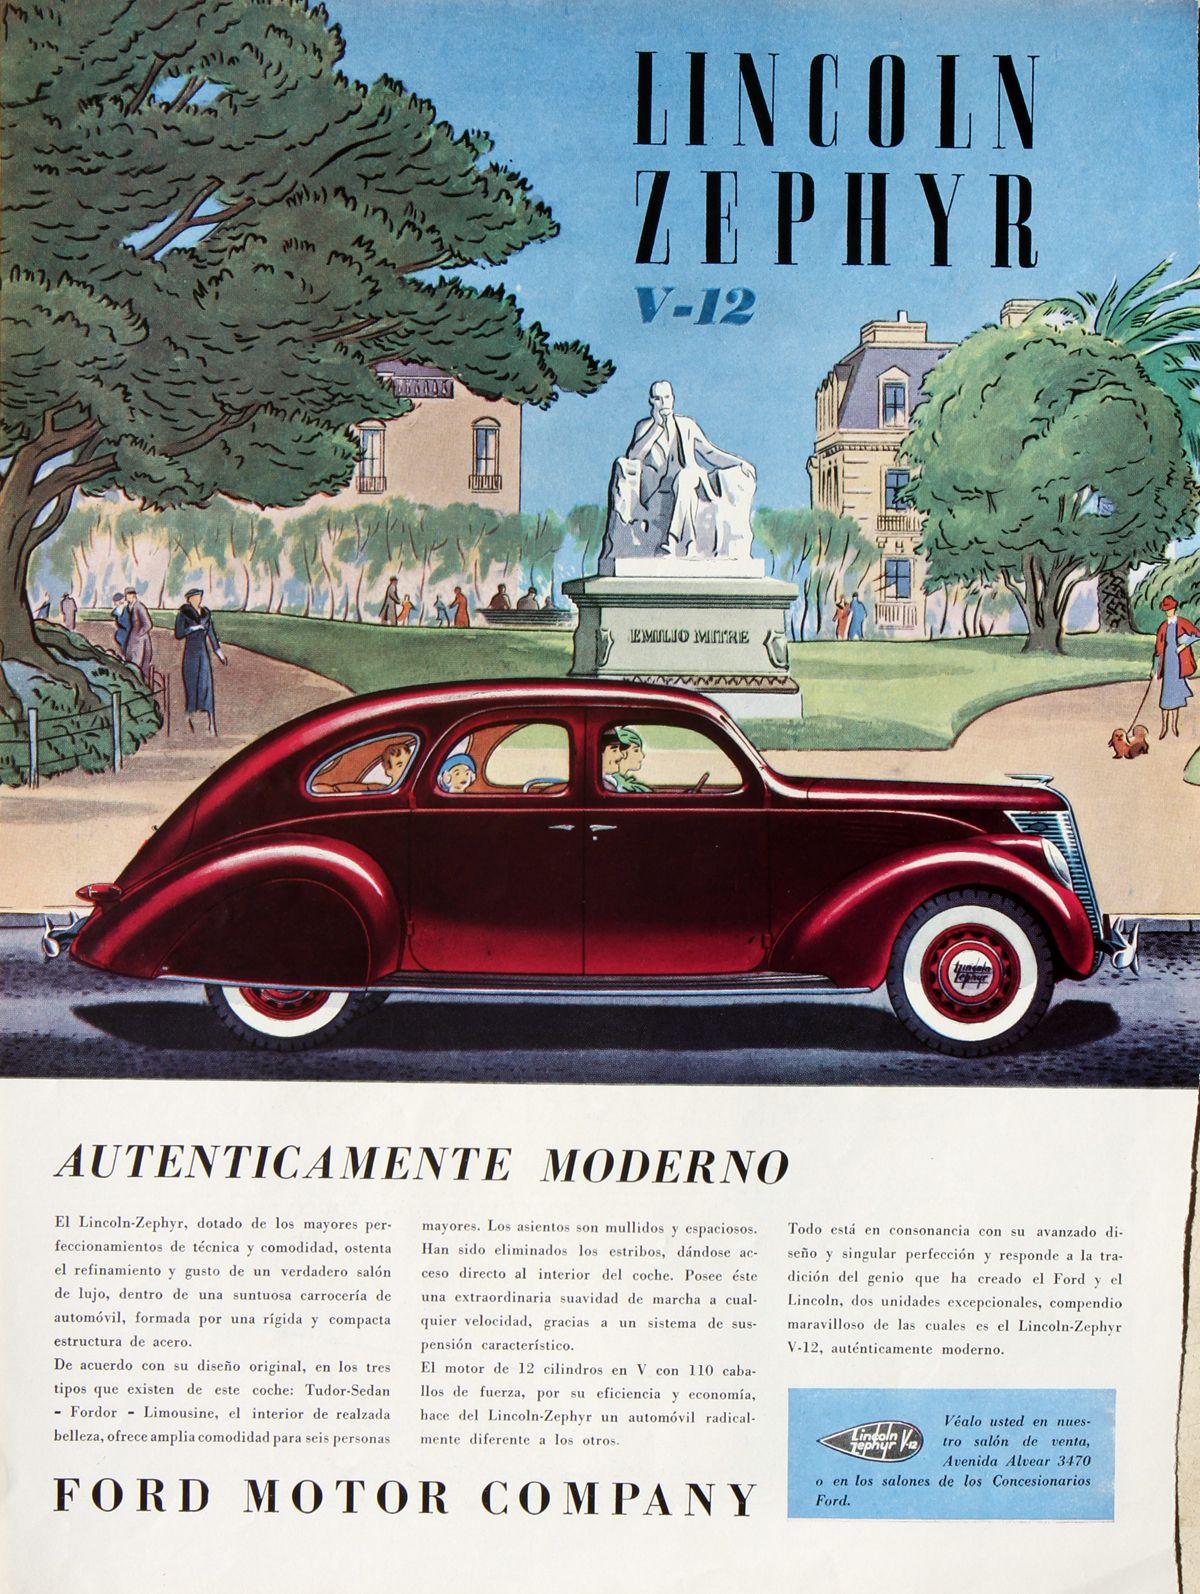 Lincoln Zephyr V12 Emilio Mitre_Argentinaweb